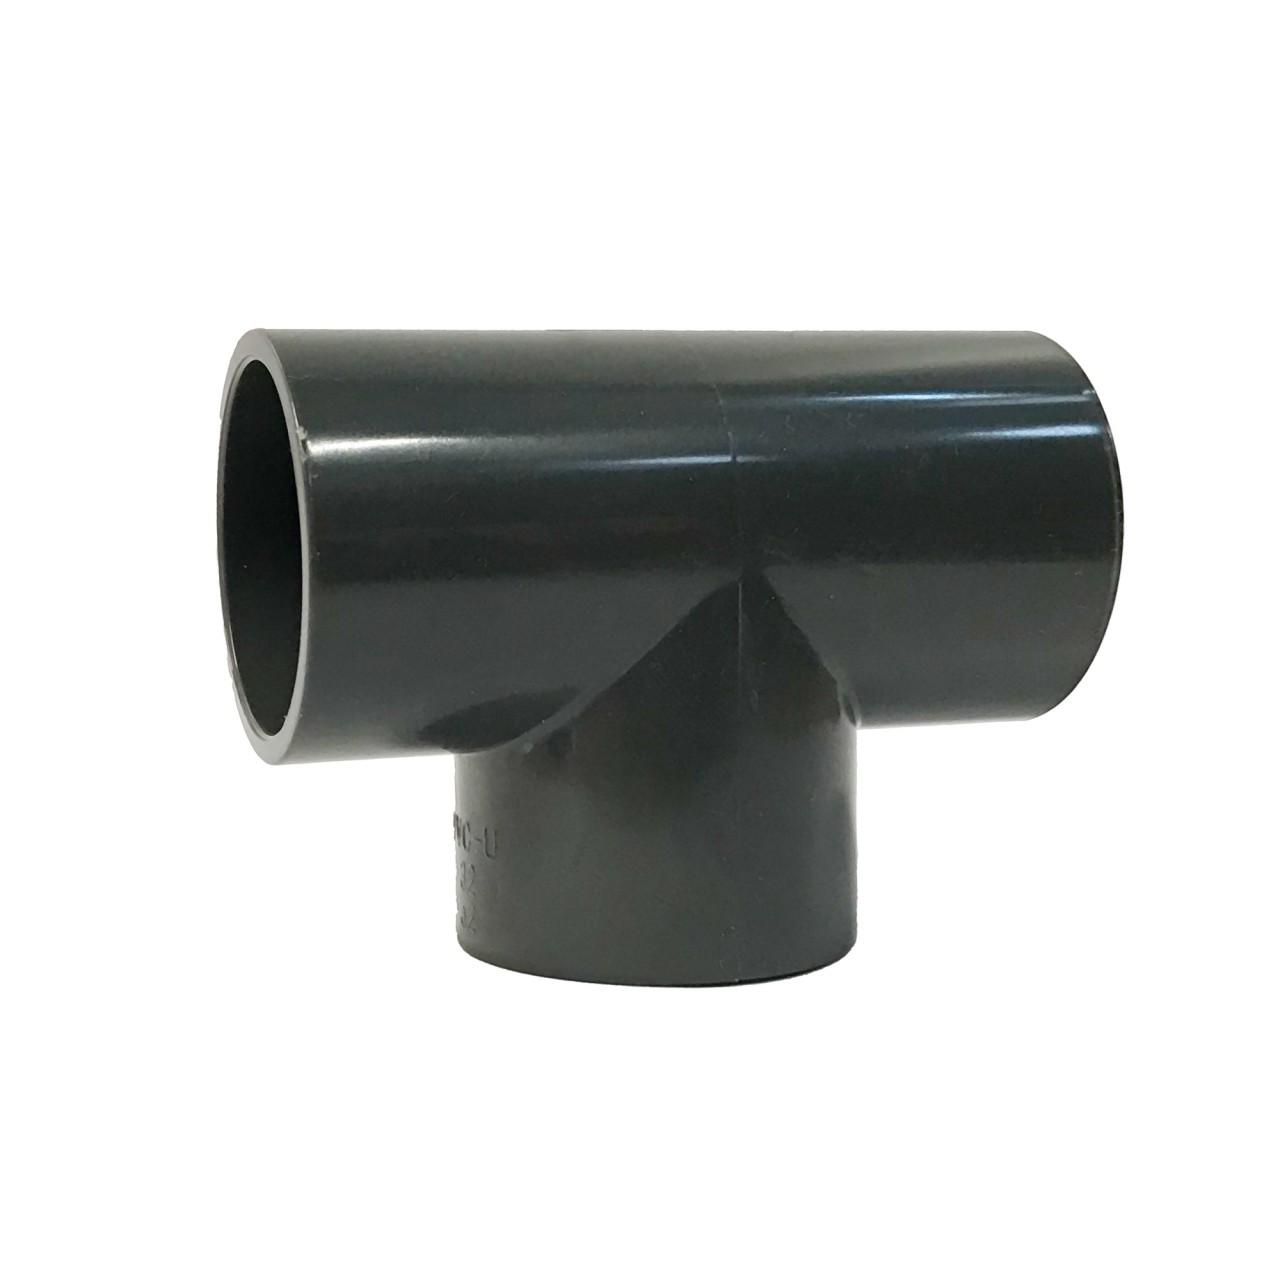 PVC-U T-Stück 90° dreifach Klebemuffe 50 mm